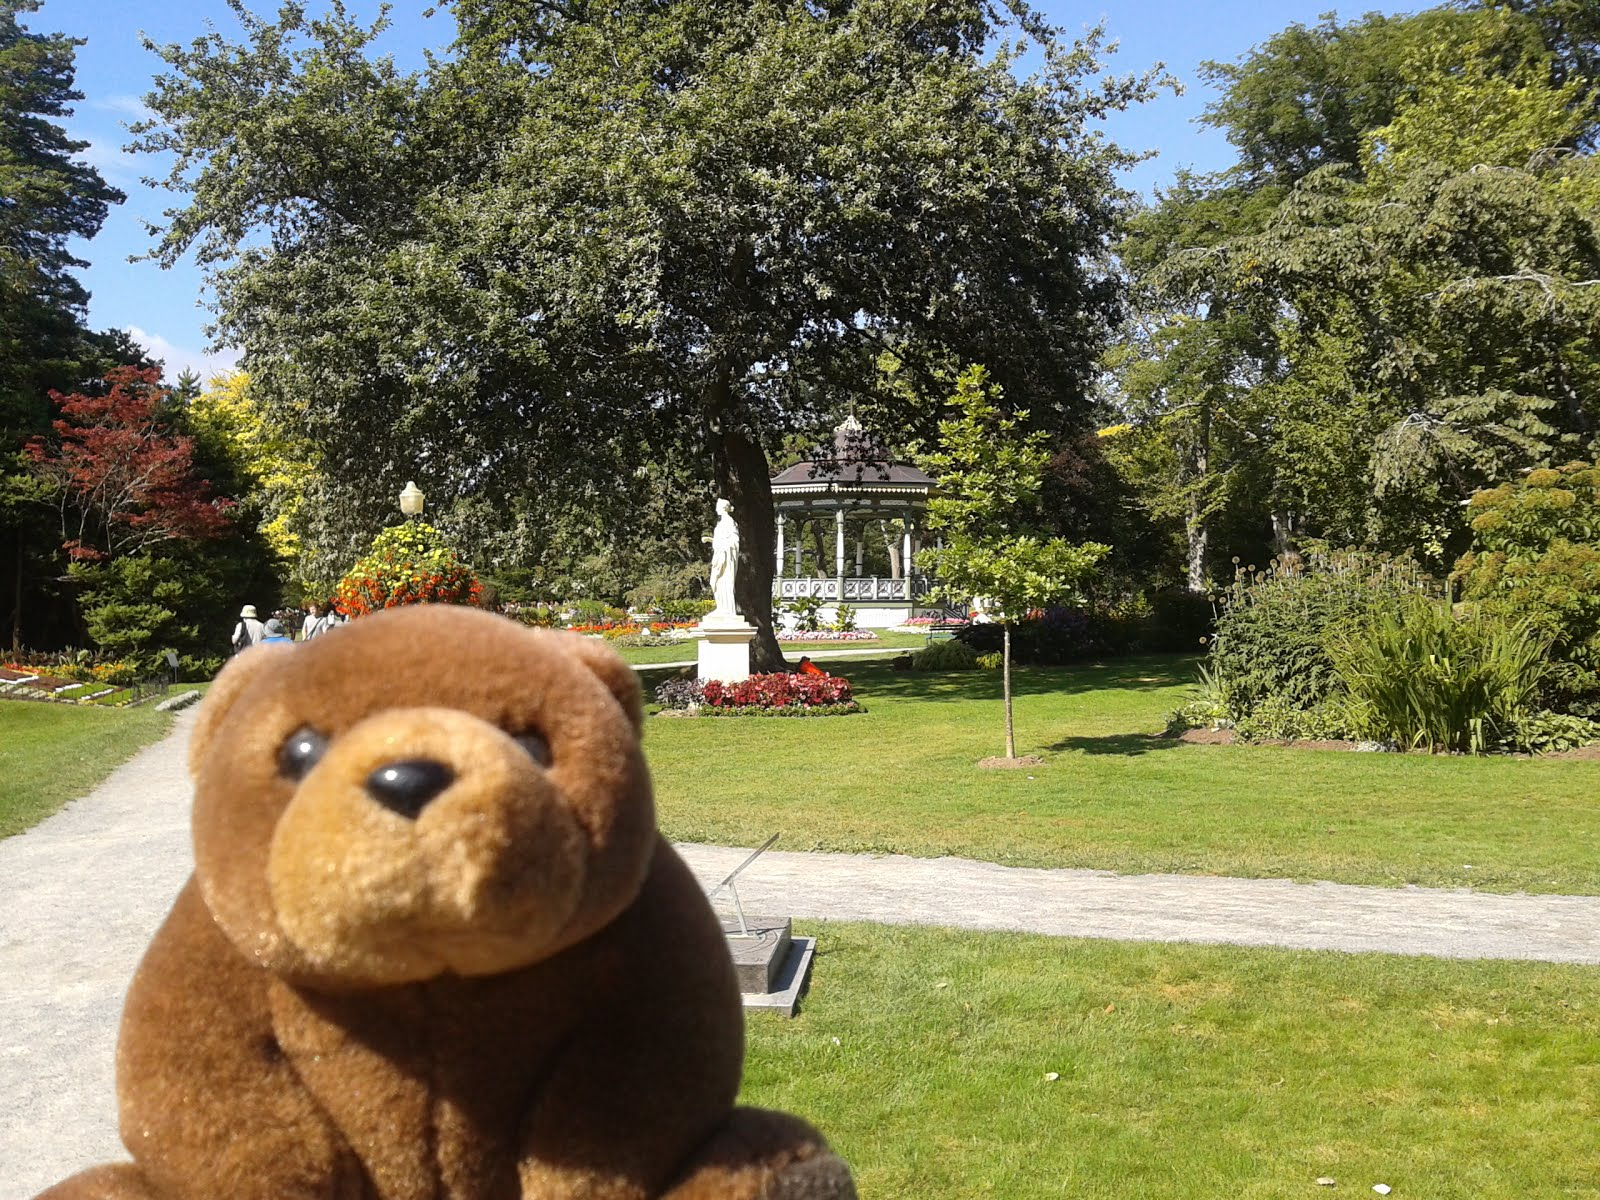 Teddy Garden in Halifax, Canada